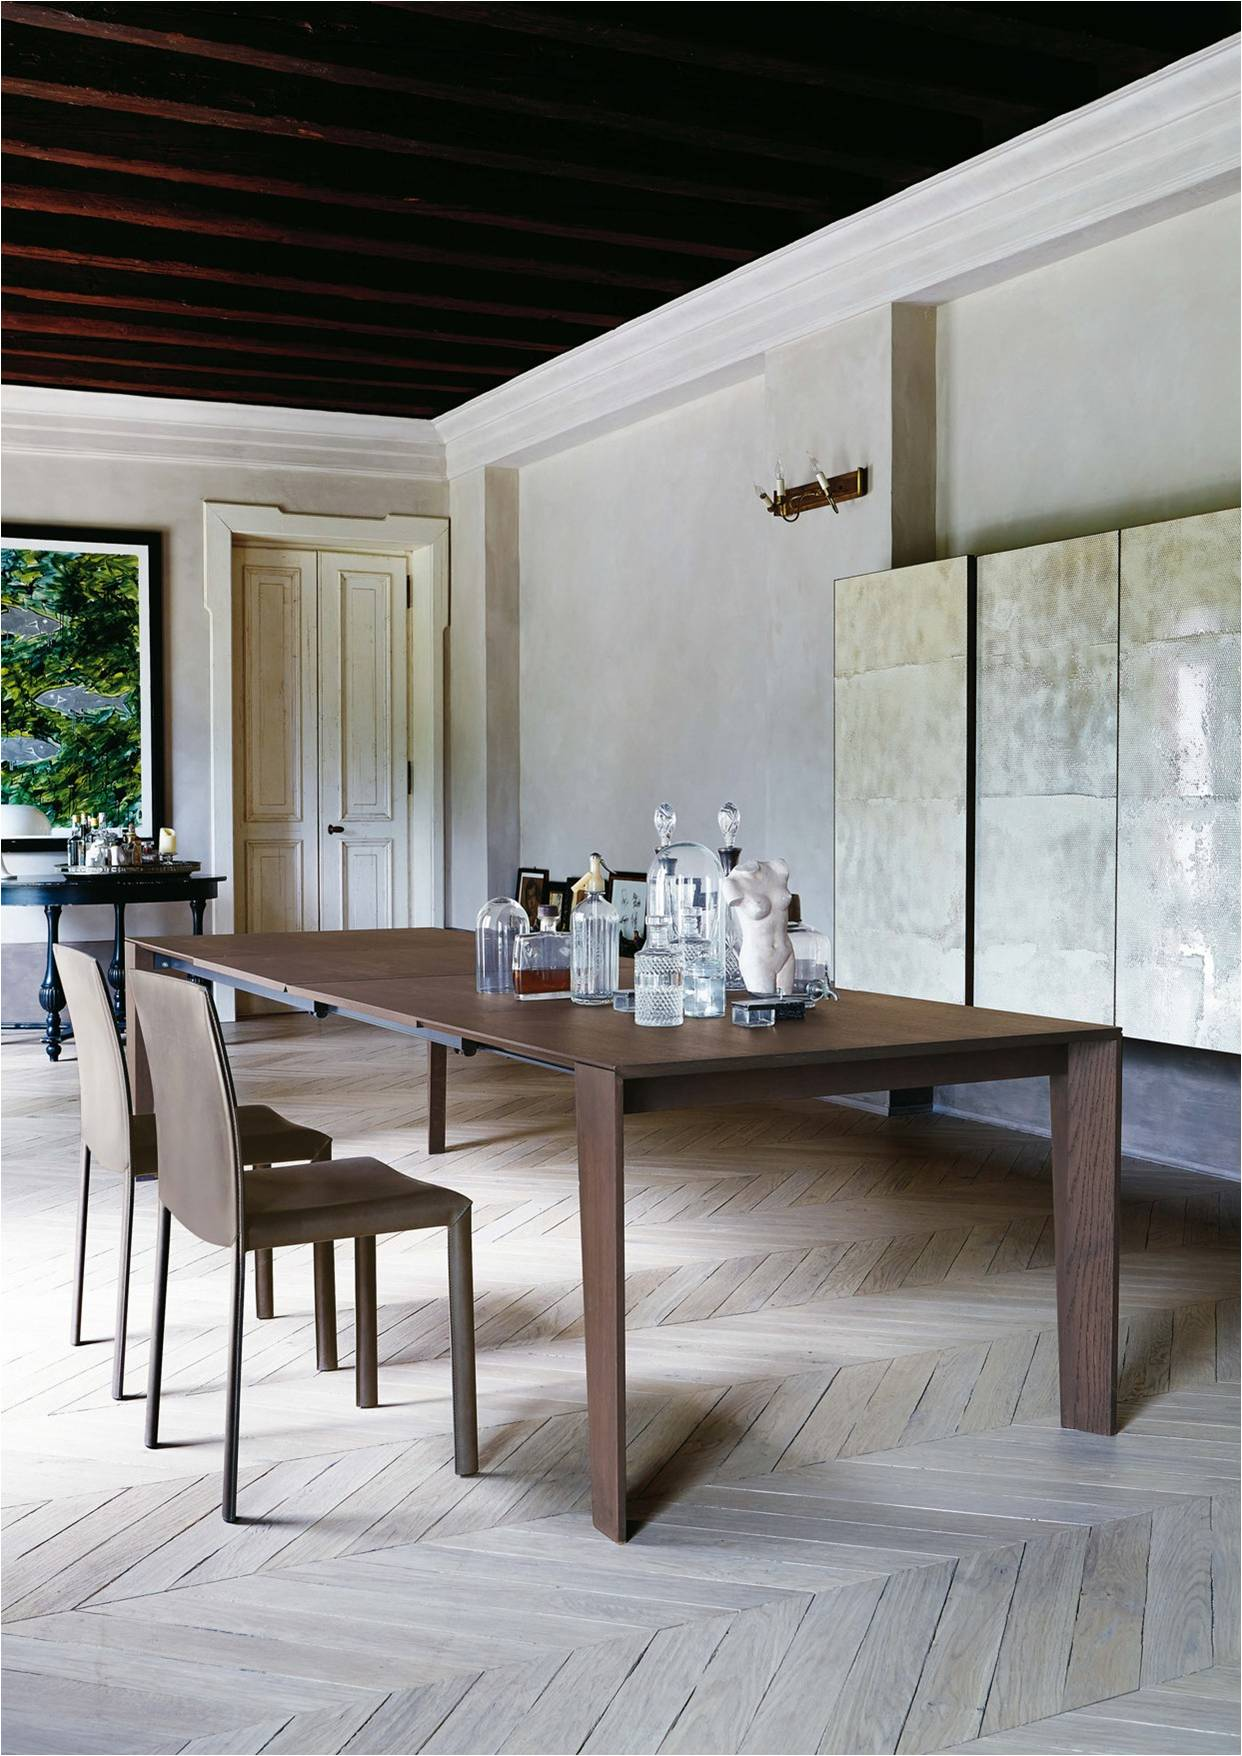 Mesas de comedor -Aspen